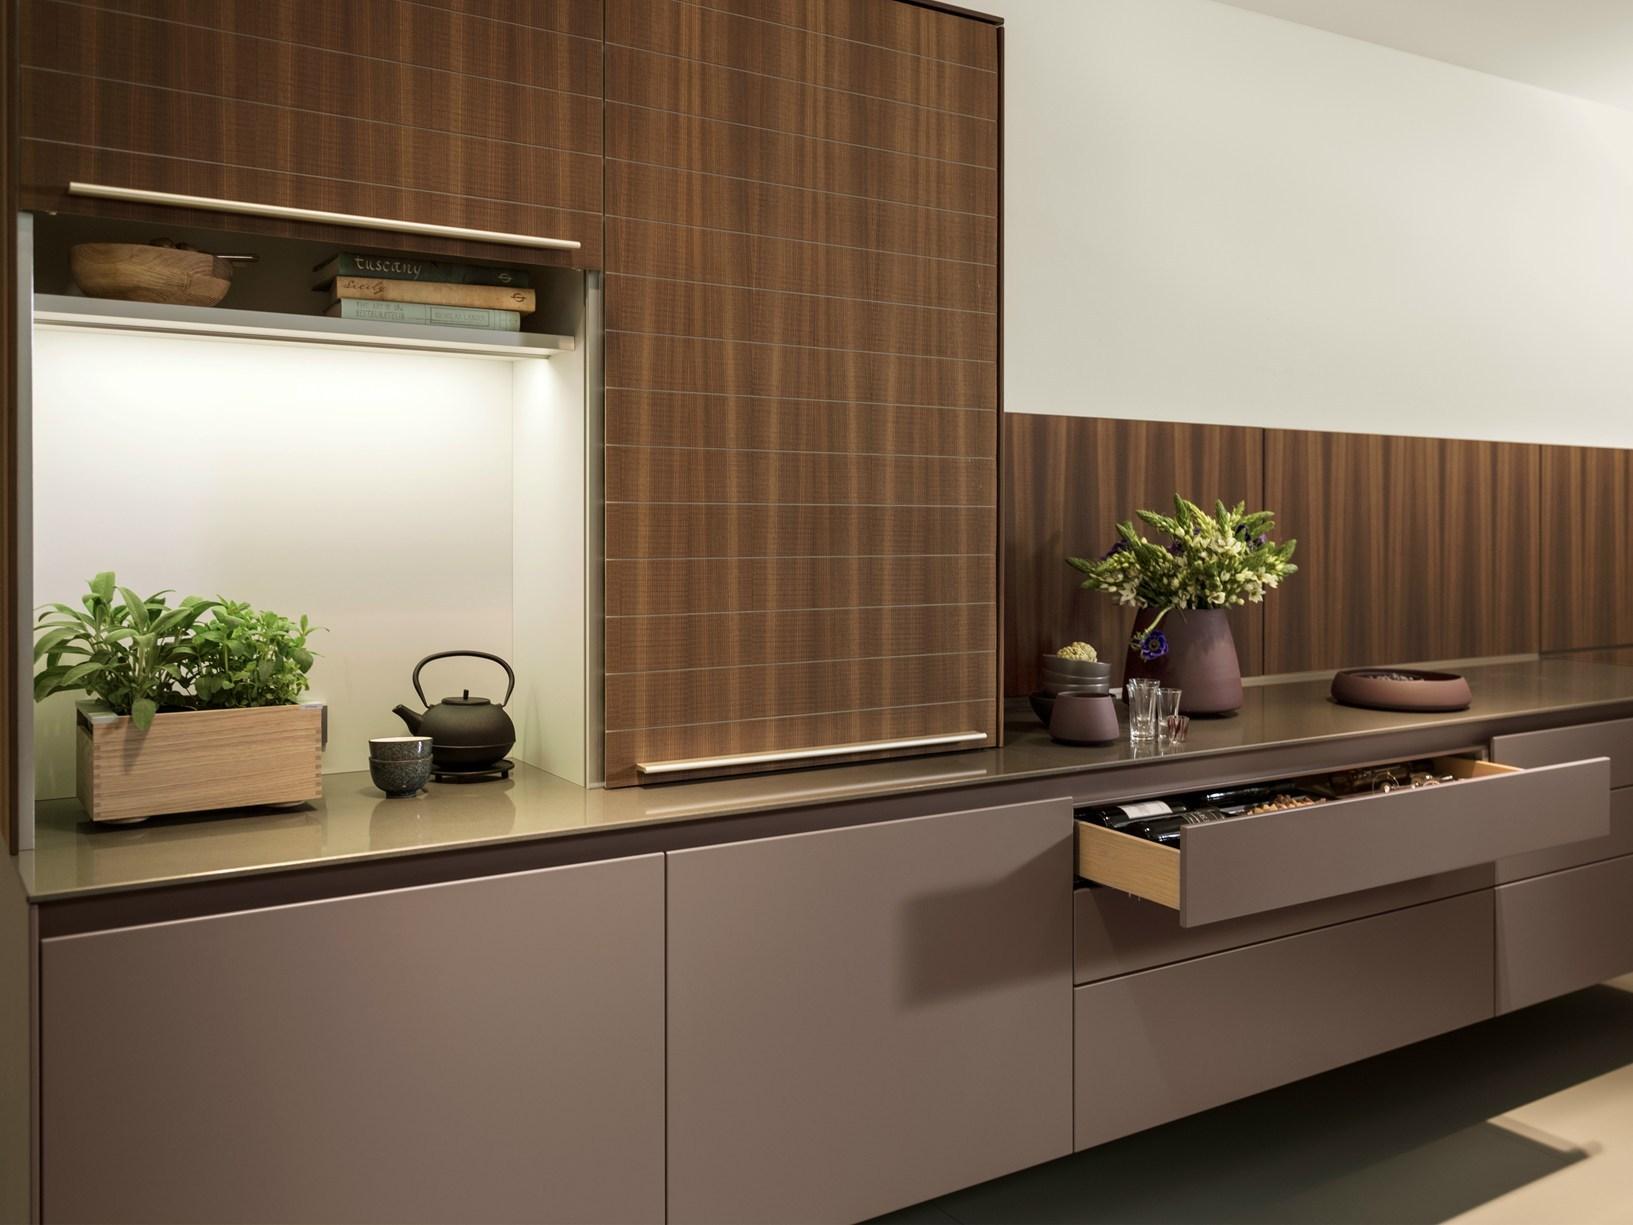 le cucine bulthaup al fuorisalone. Black Bedroom Furniture Sets. Home Design Ideas